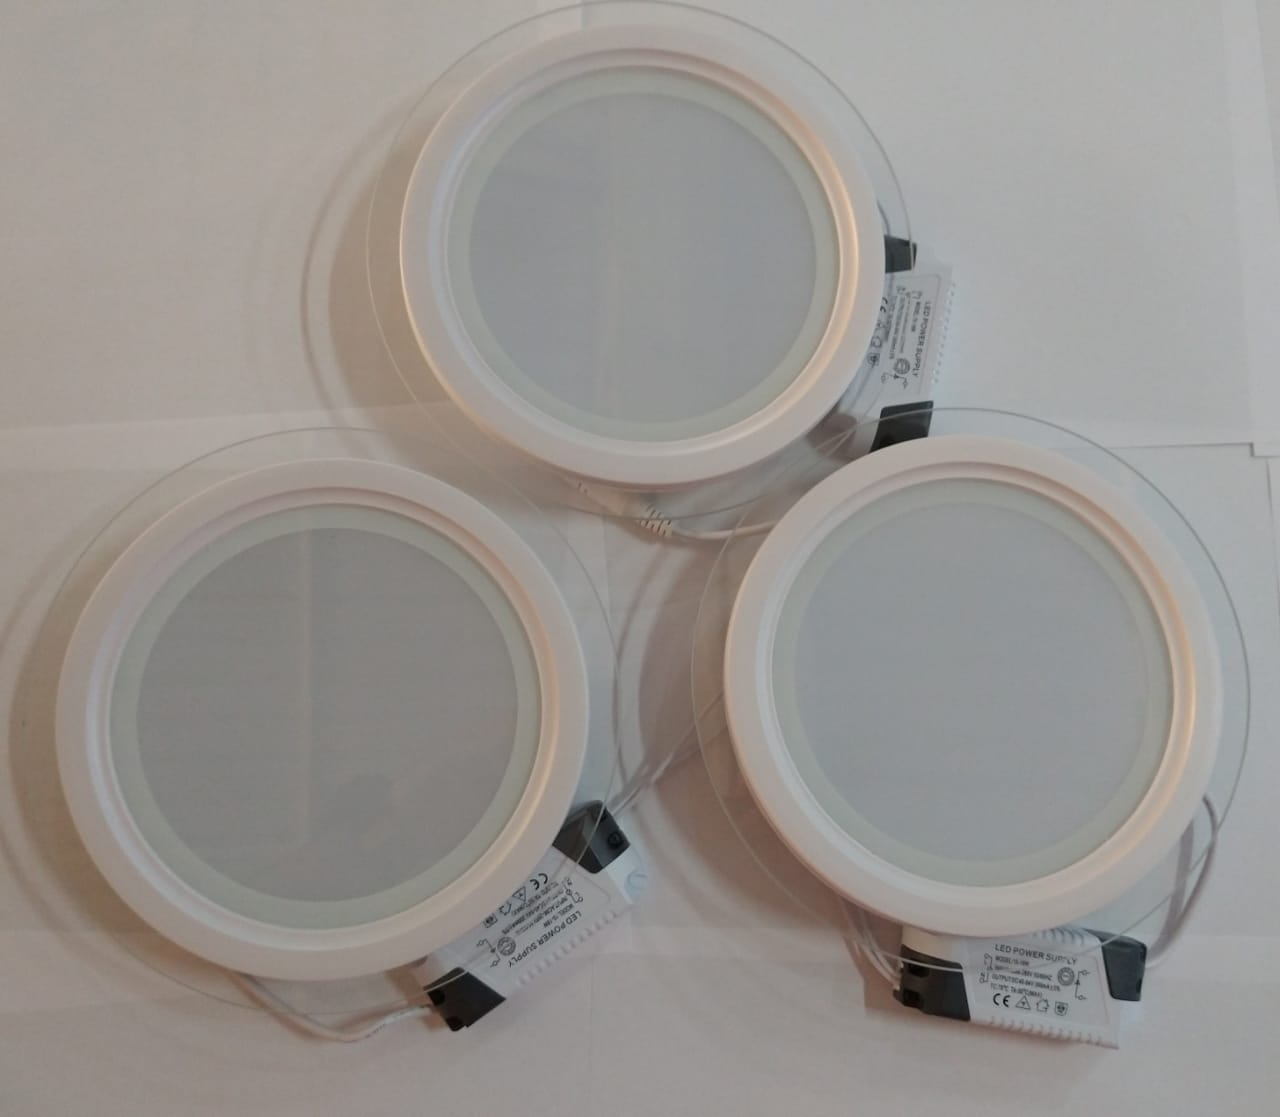 Kit 3 Luminaria Embutir Redonda Vidro 18W LED 3200K Morna MBtech